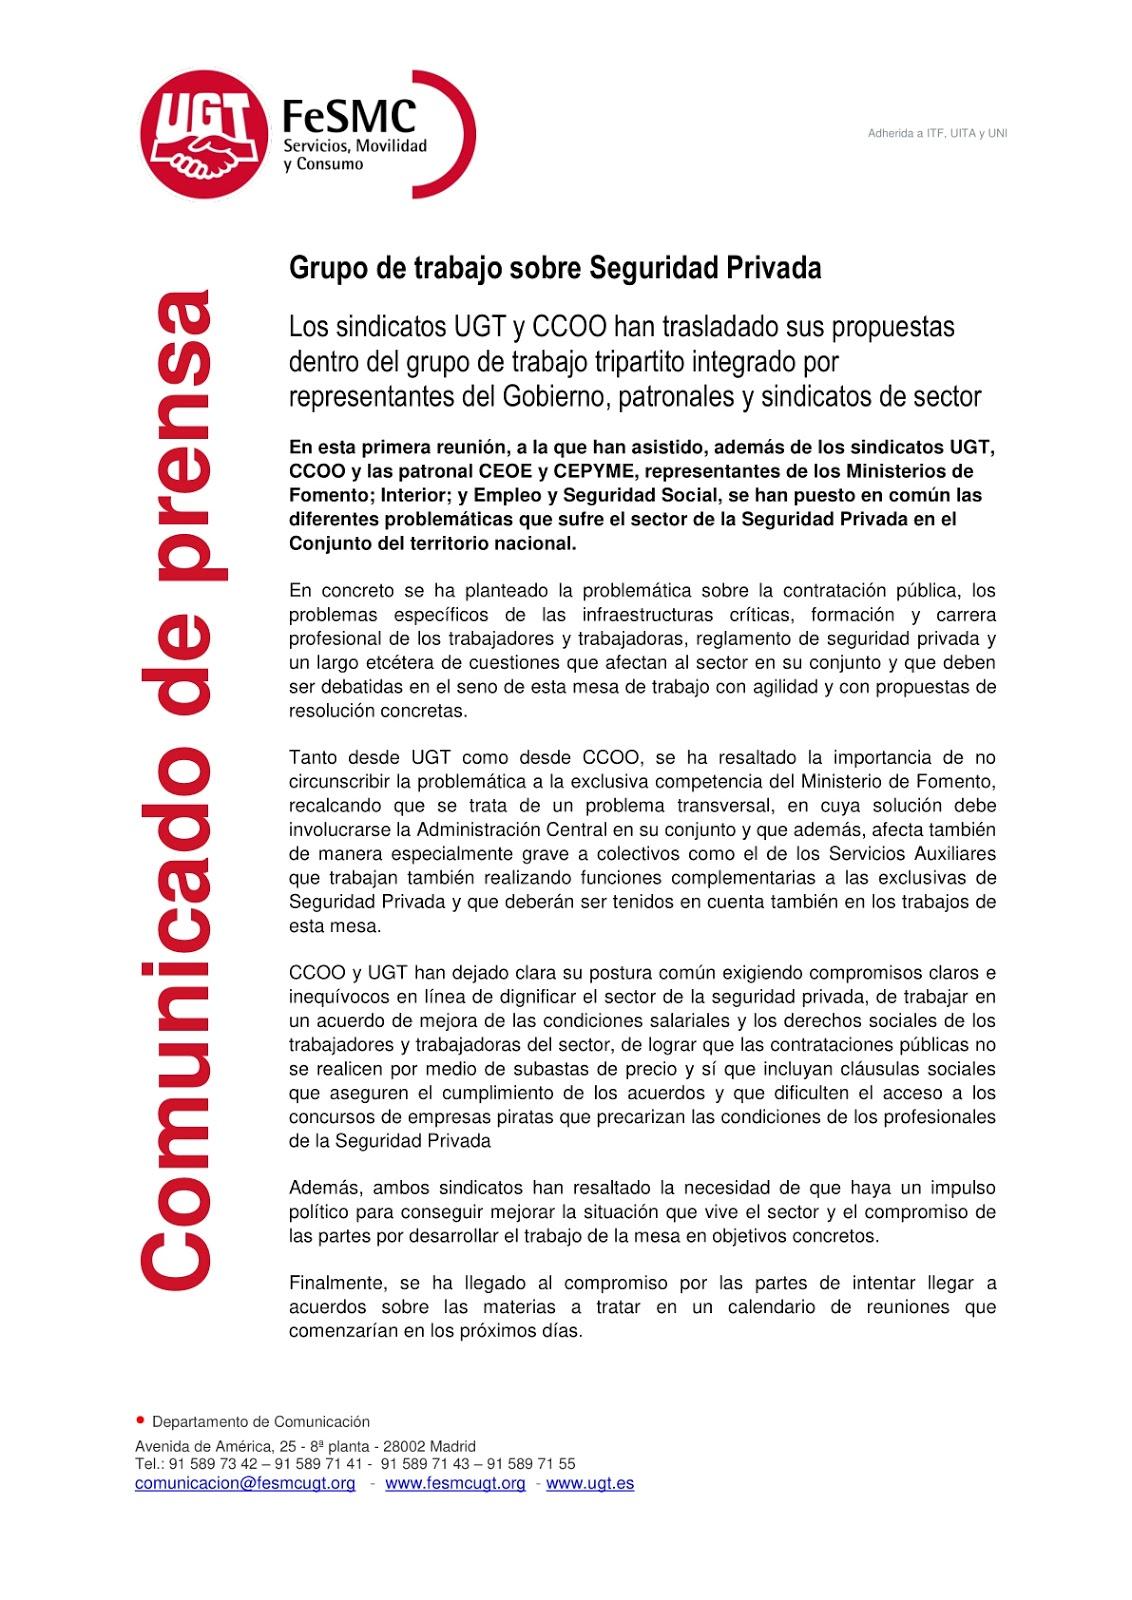 [1]Comunicado prensa Grupo Trabajo Seguridad Privada